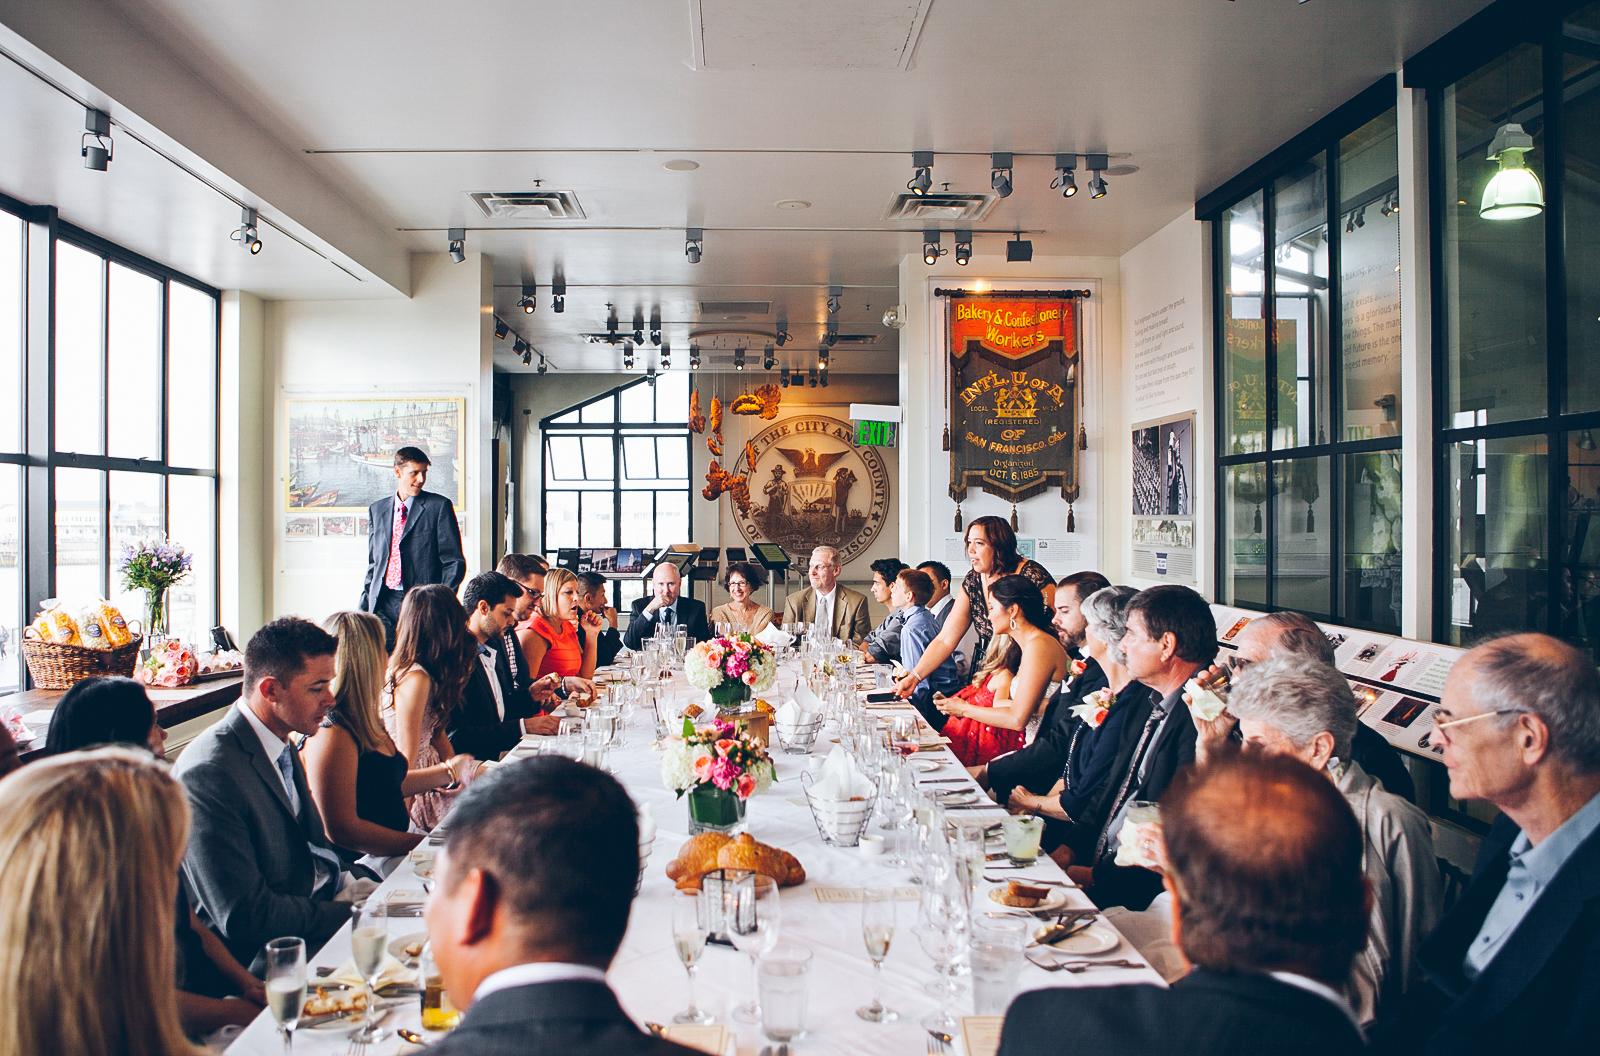 San_francisco_city_hall_wedding_photography_meegan_travis_ebony_siovhan_bokeh_photography_78.jpg